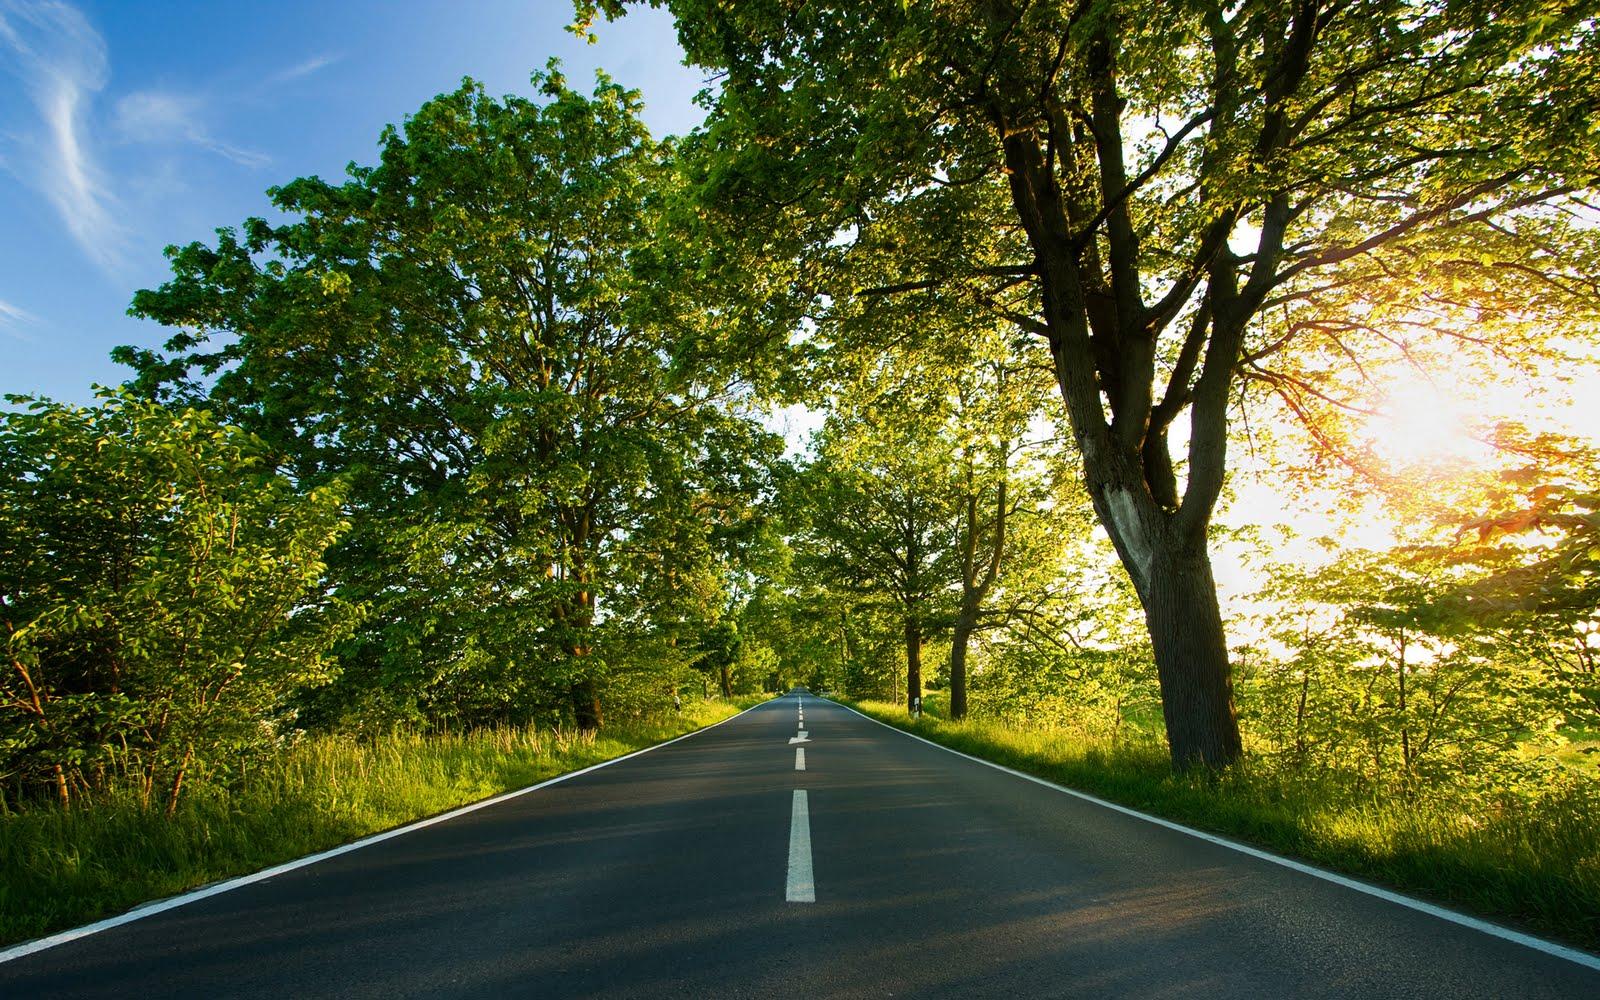 http://3.bp.blogspot.com/-7_VnBdQJnvM/TmS_hiXMIZI/AAAAAAAAAdc/9ROo2aQzaJU/s1600/Wallpapers-room_com___One_Path_Wallpaper_by_emats_1920x1200.jpg